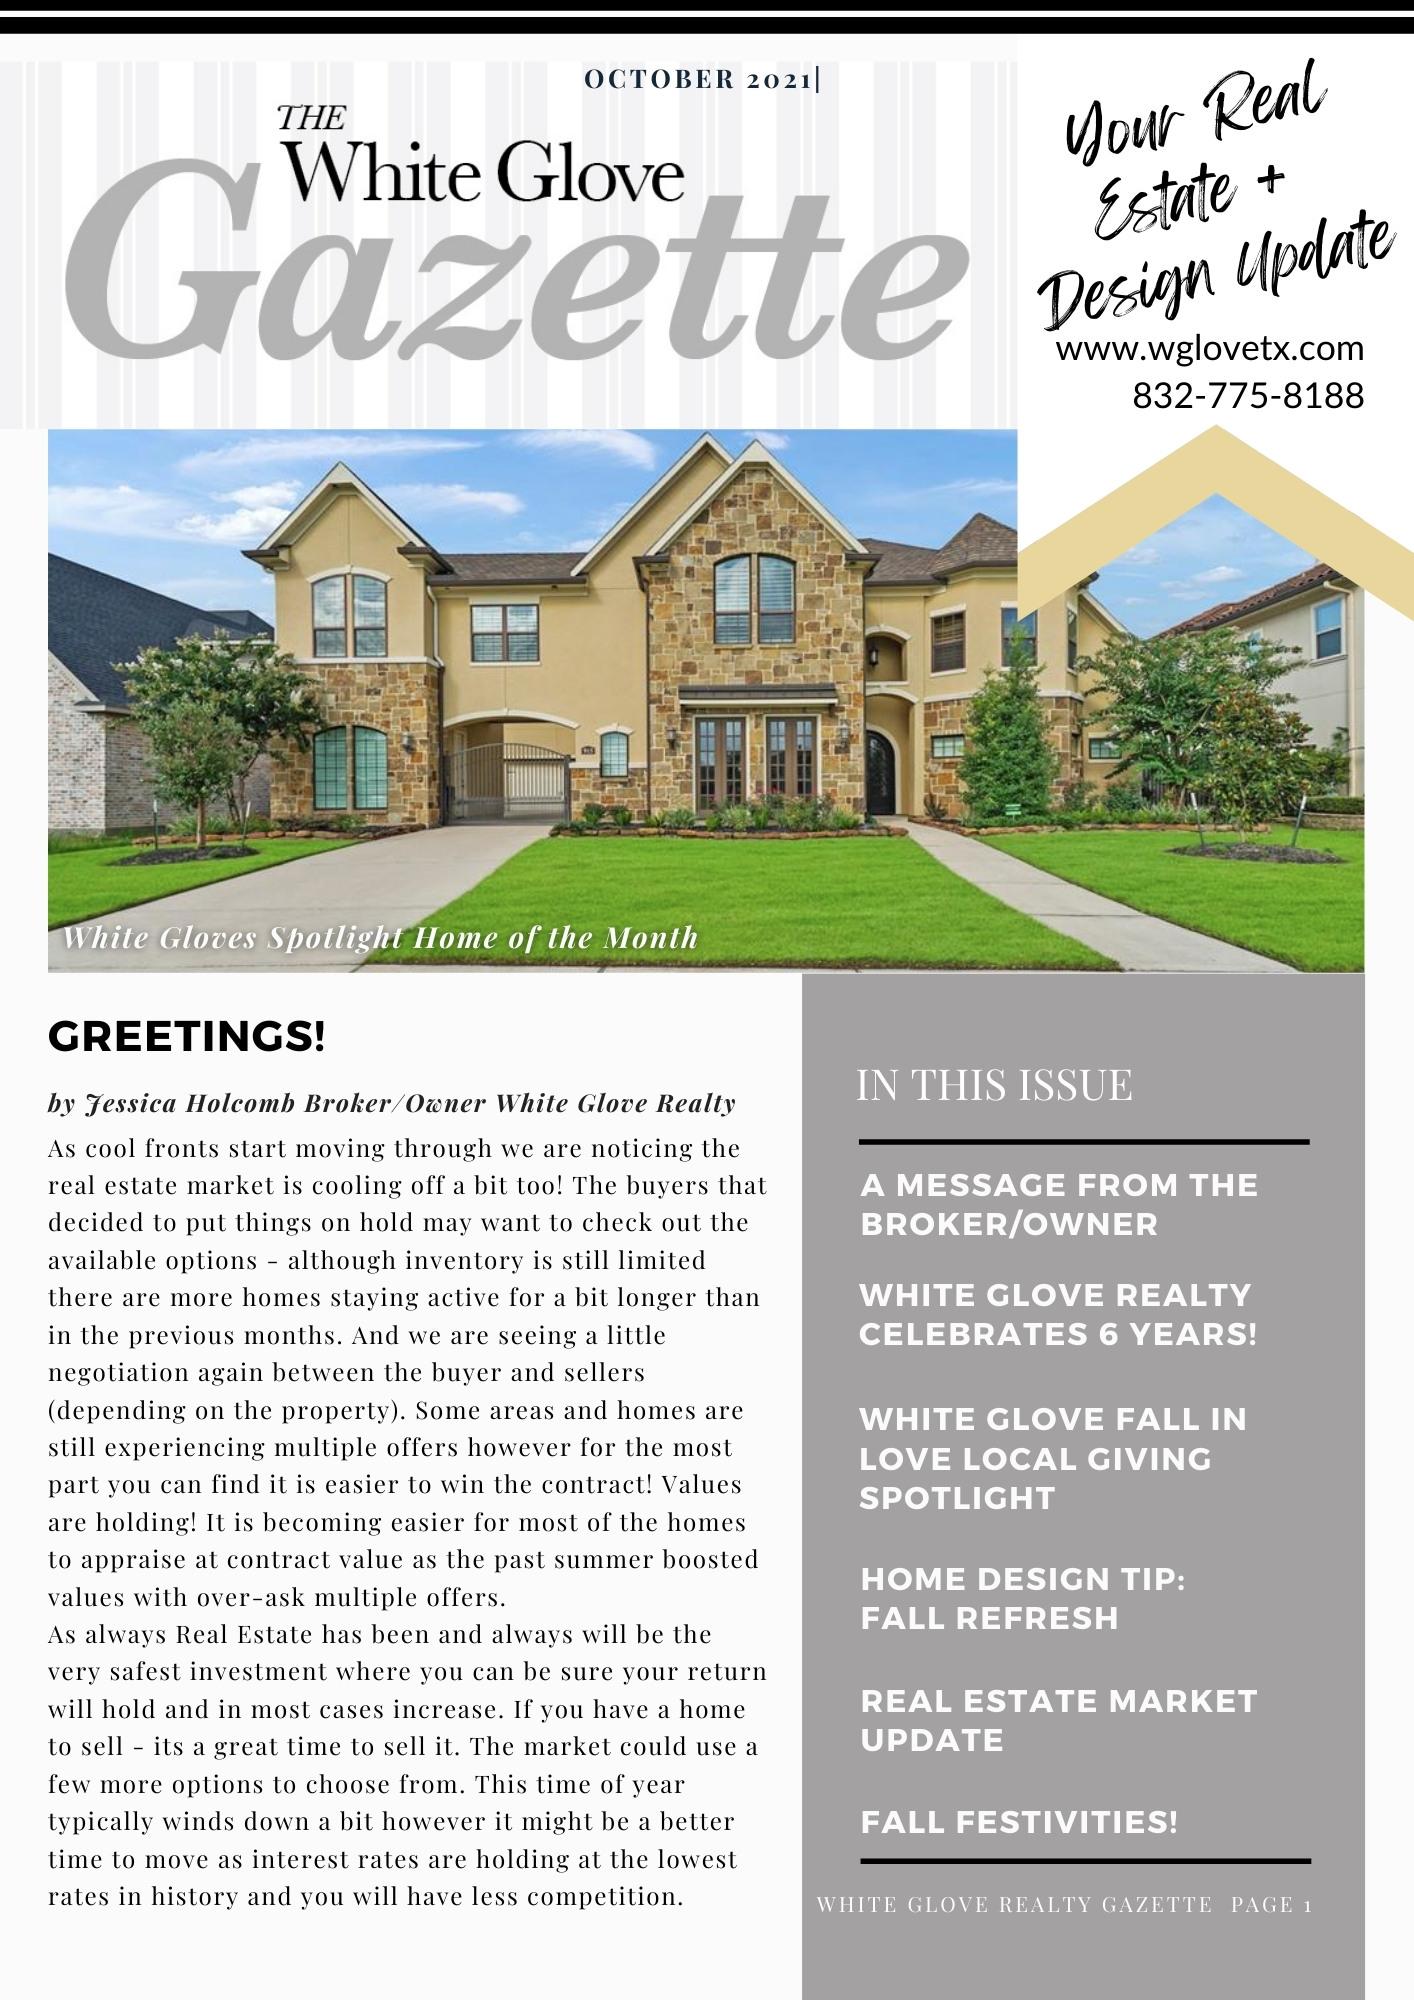 White Glove Gazette.jpg